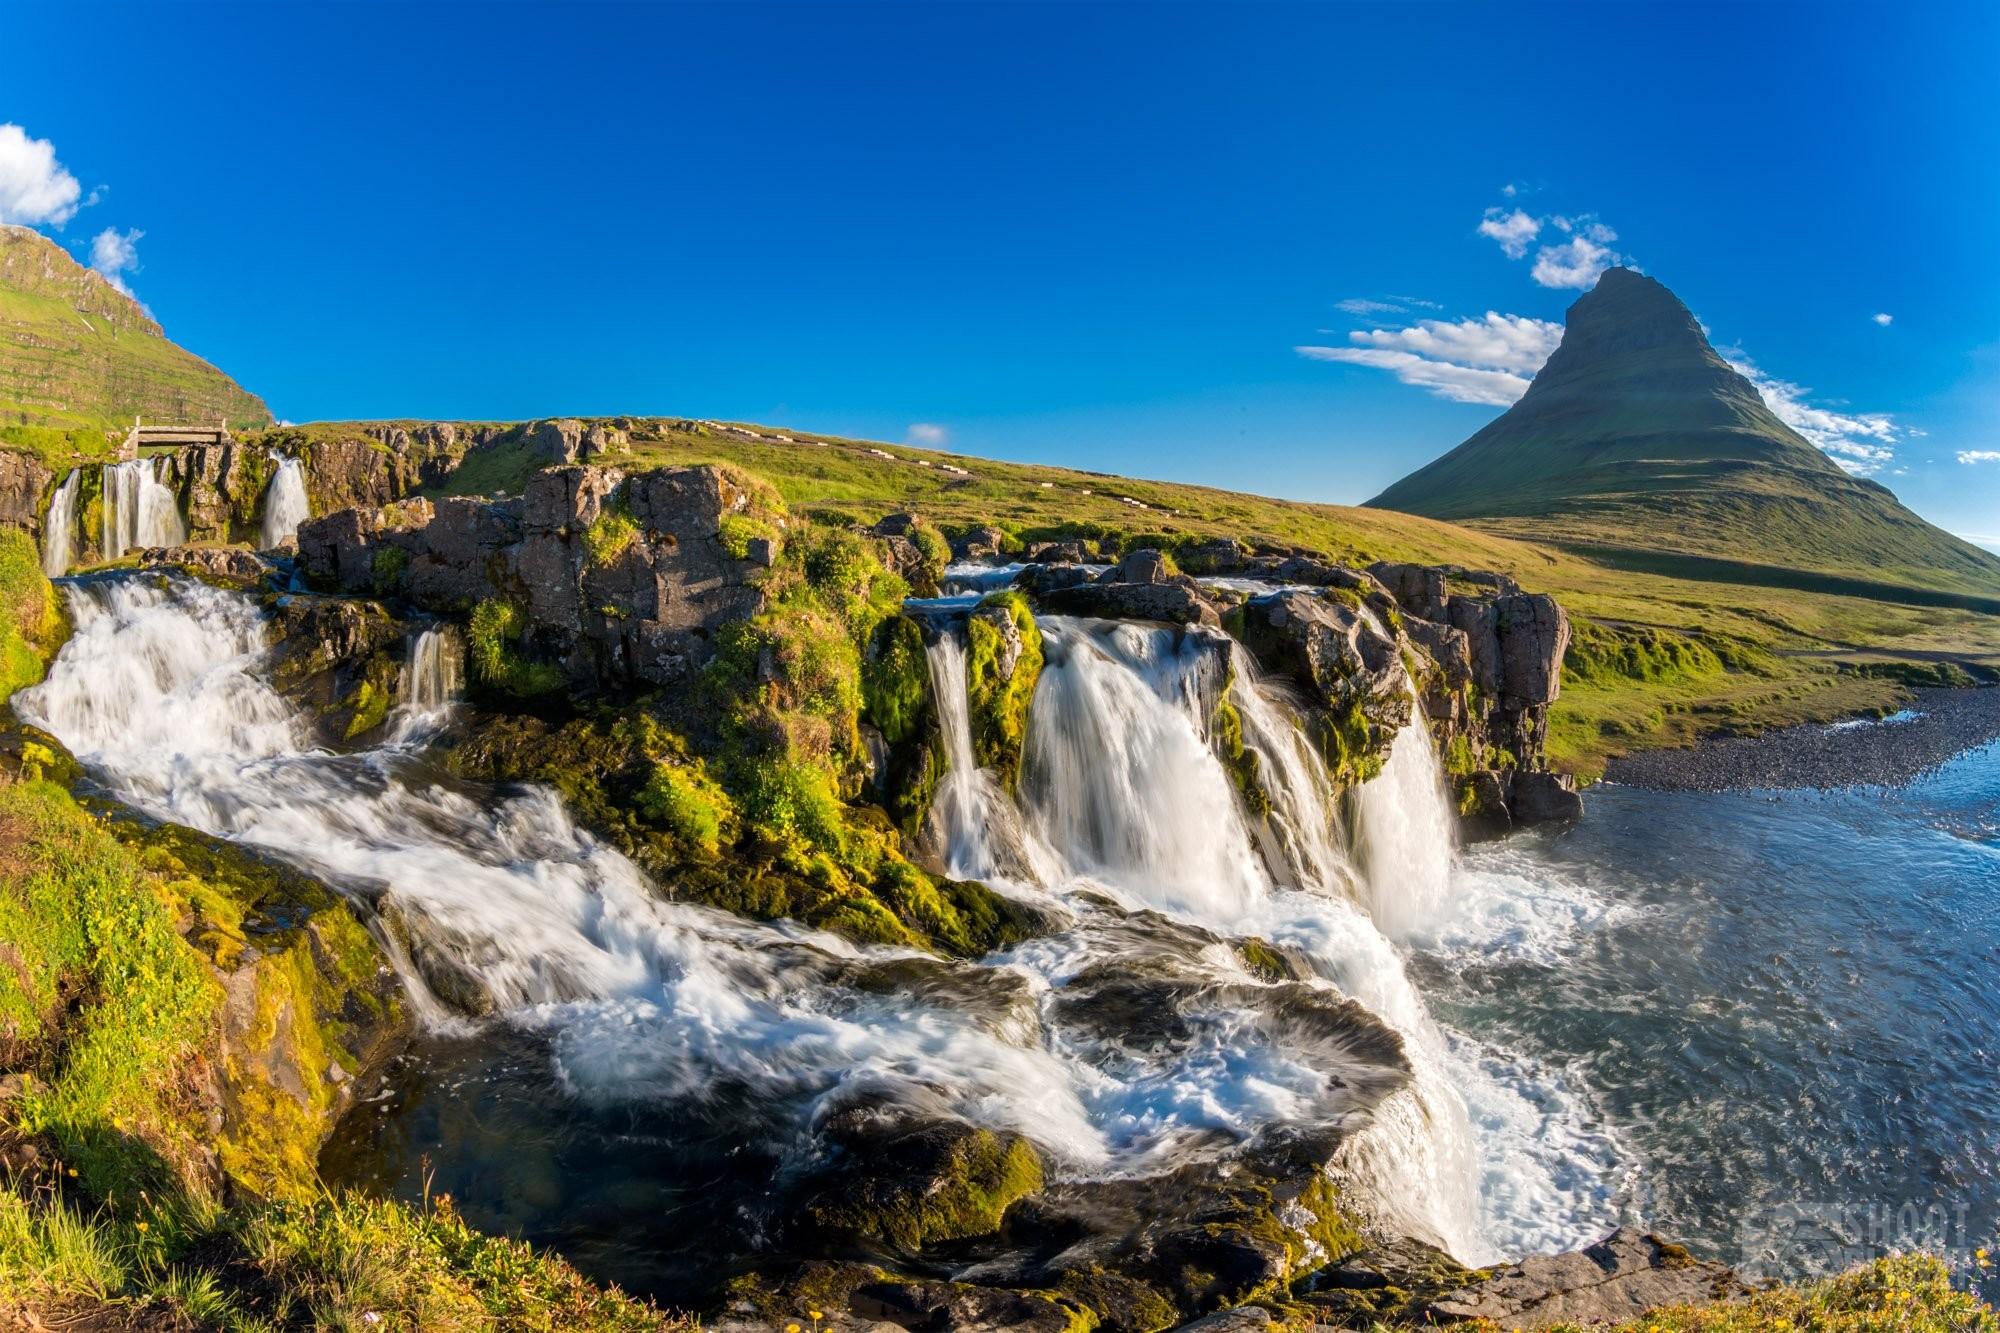 Kirkjufellsfoss falls and Kirkjufell mountain in Iceland